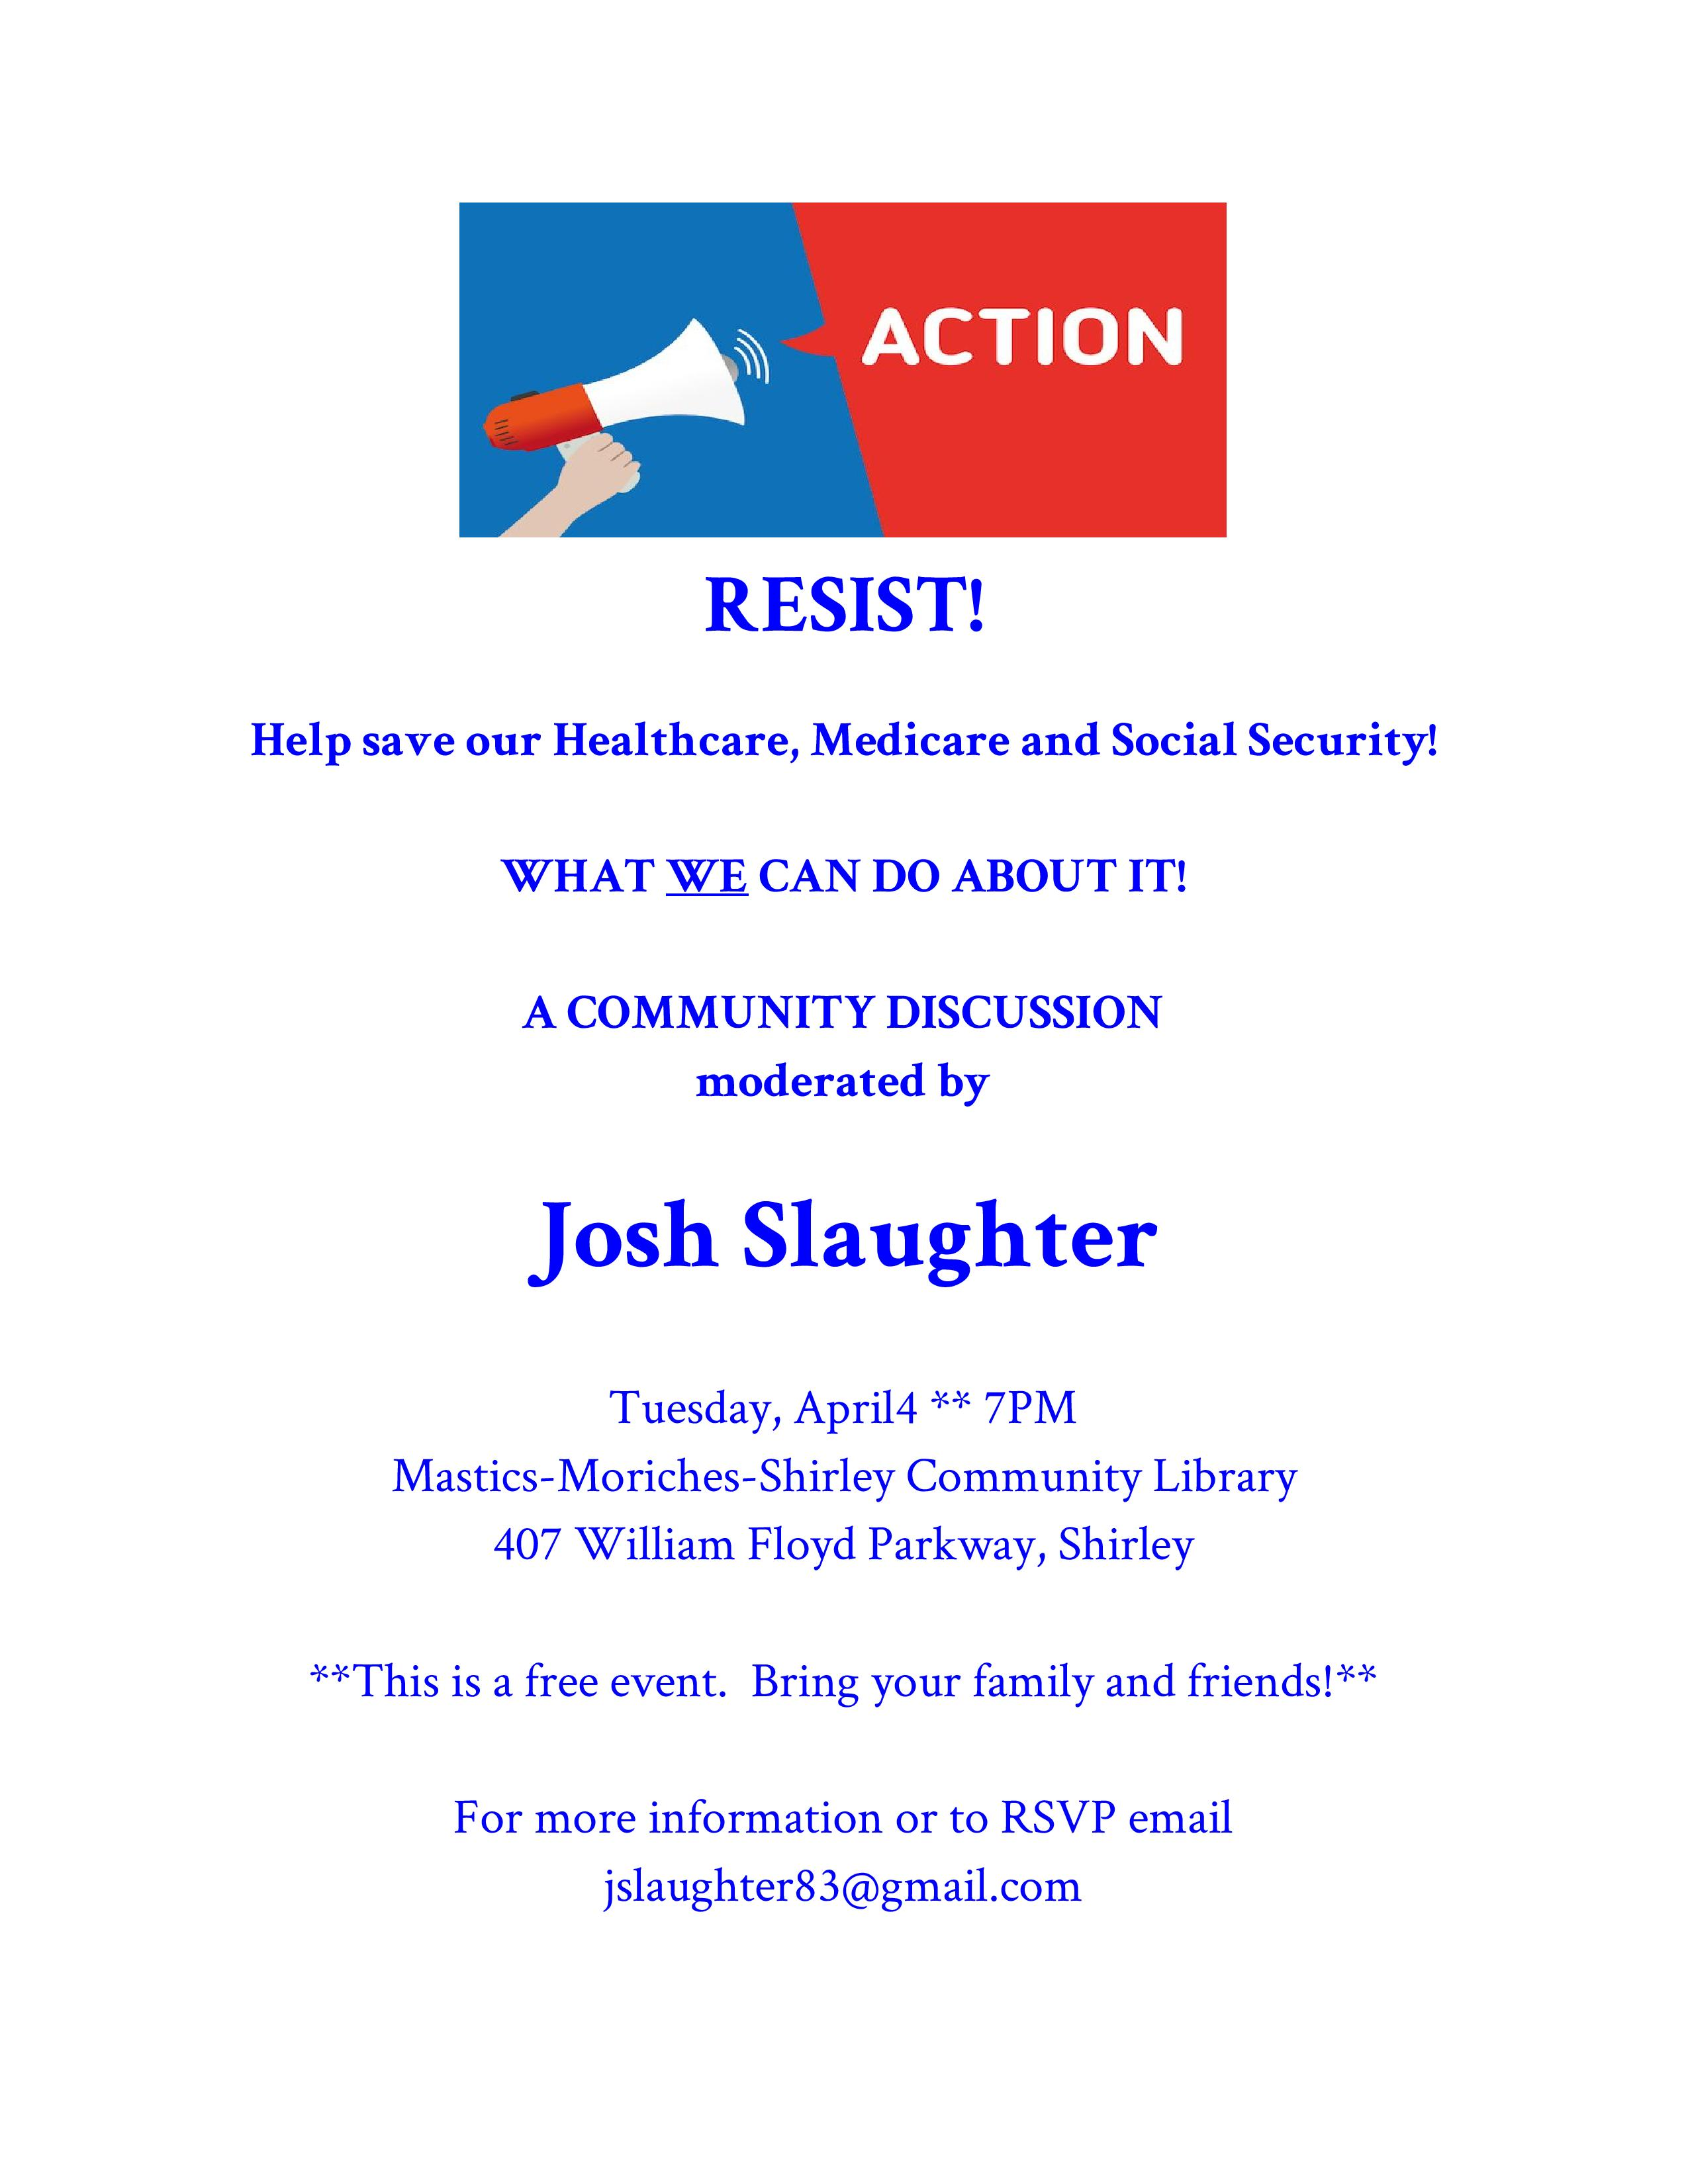 CalltoActionApril4Slaughter-page-001.jpg